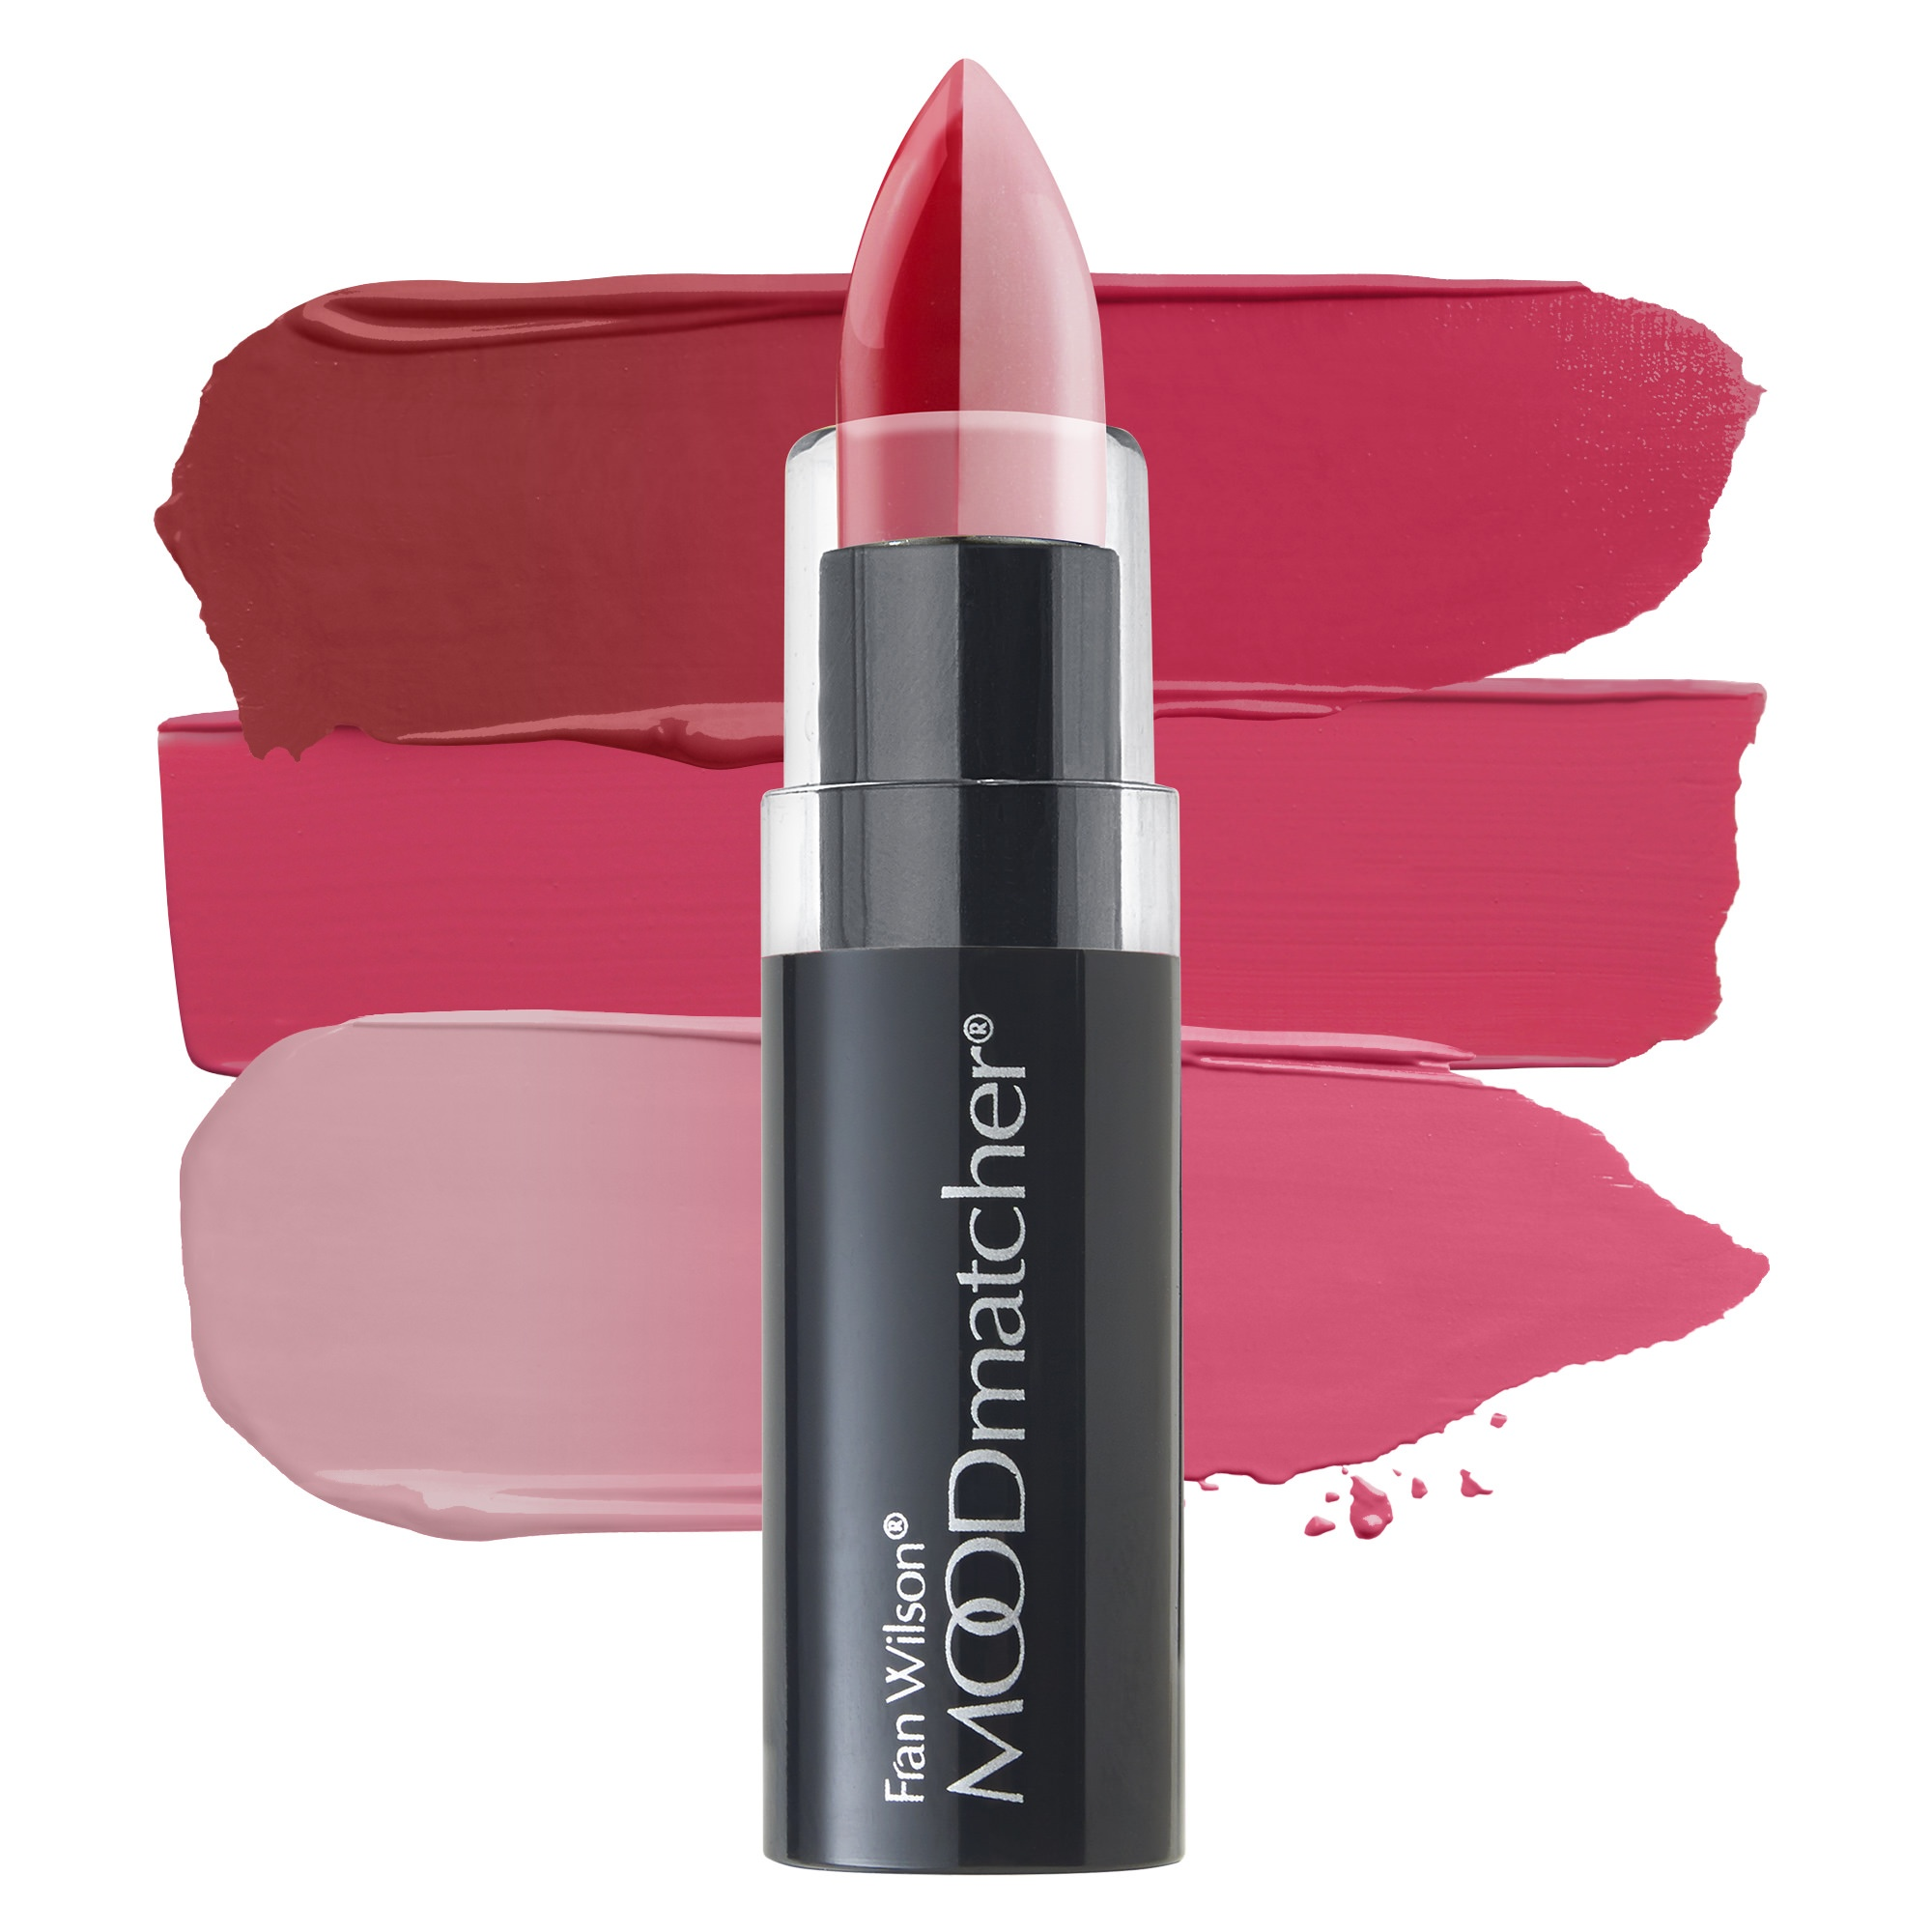 Moodmatcher Lipstick Beauty Buy Online From Liquid Matte Just Blush